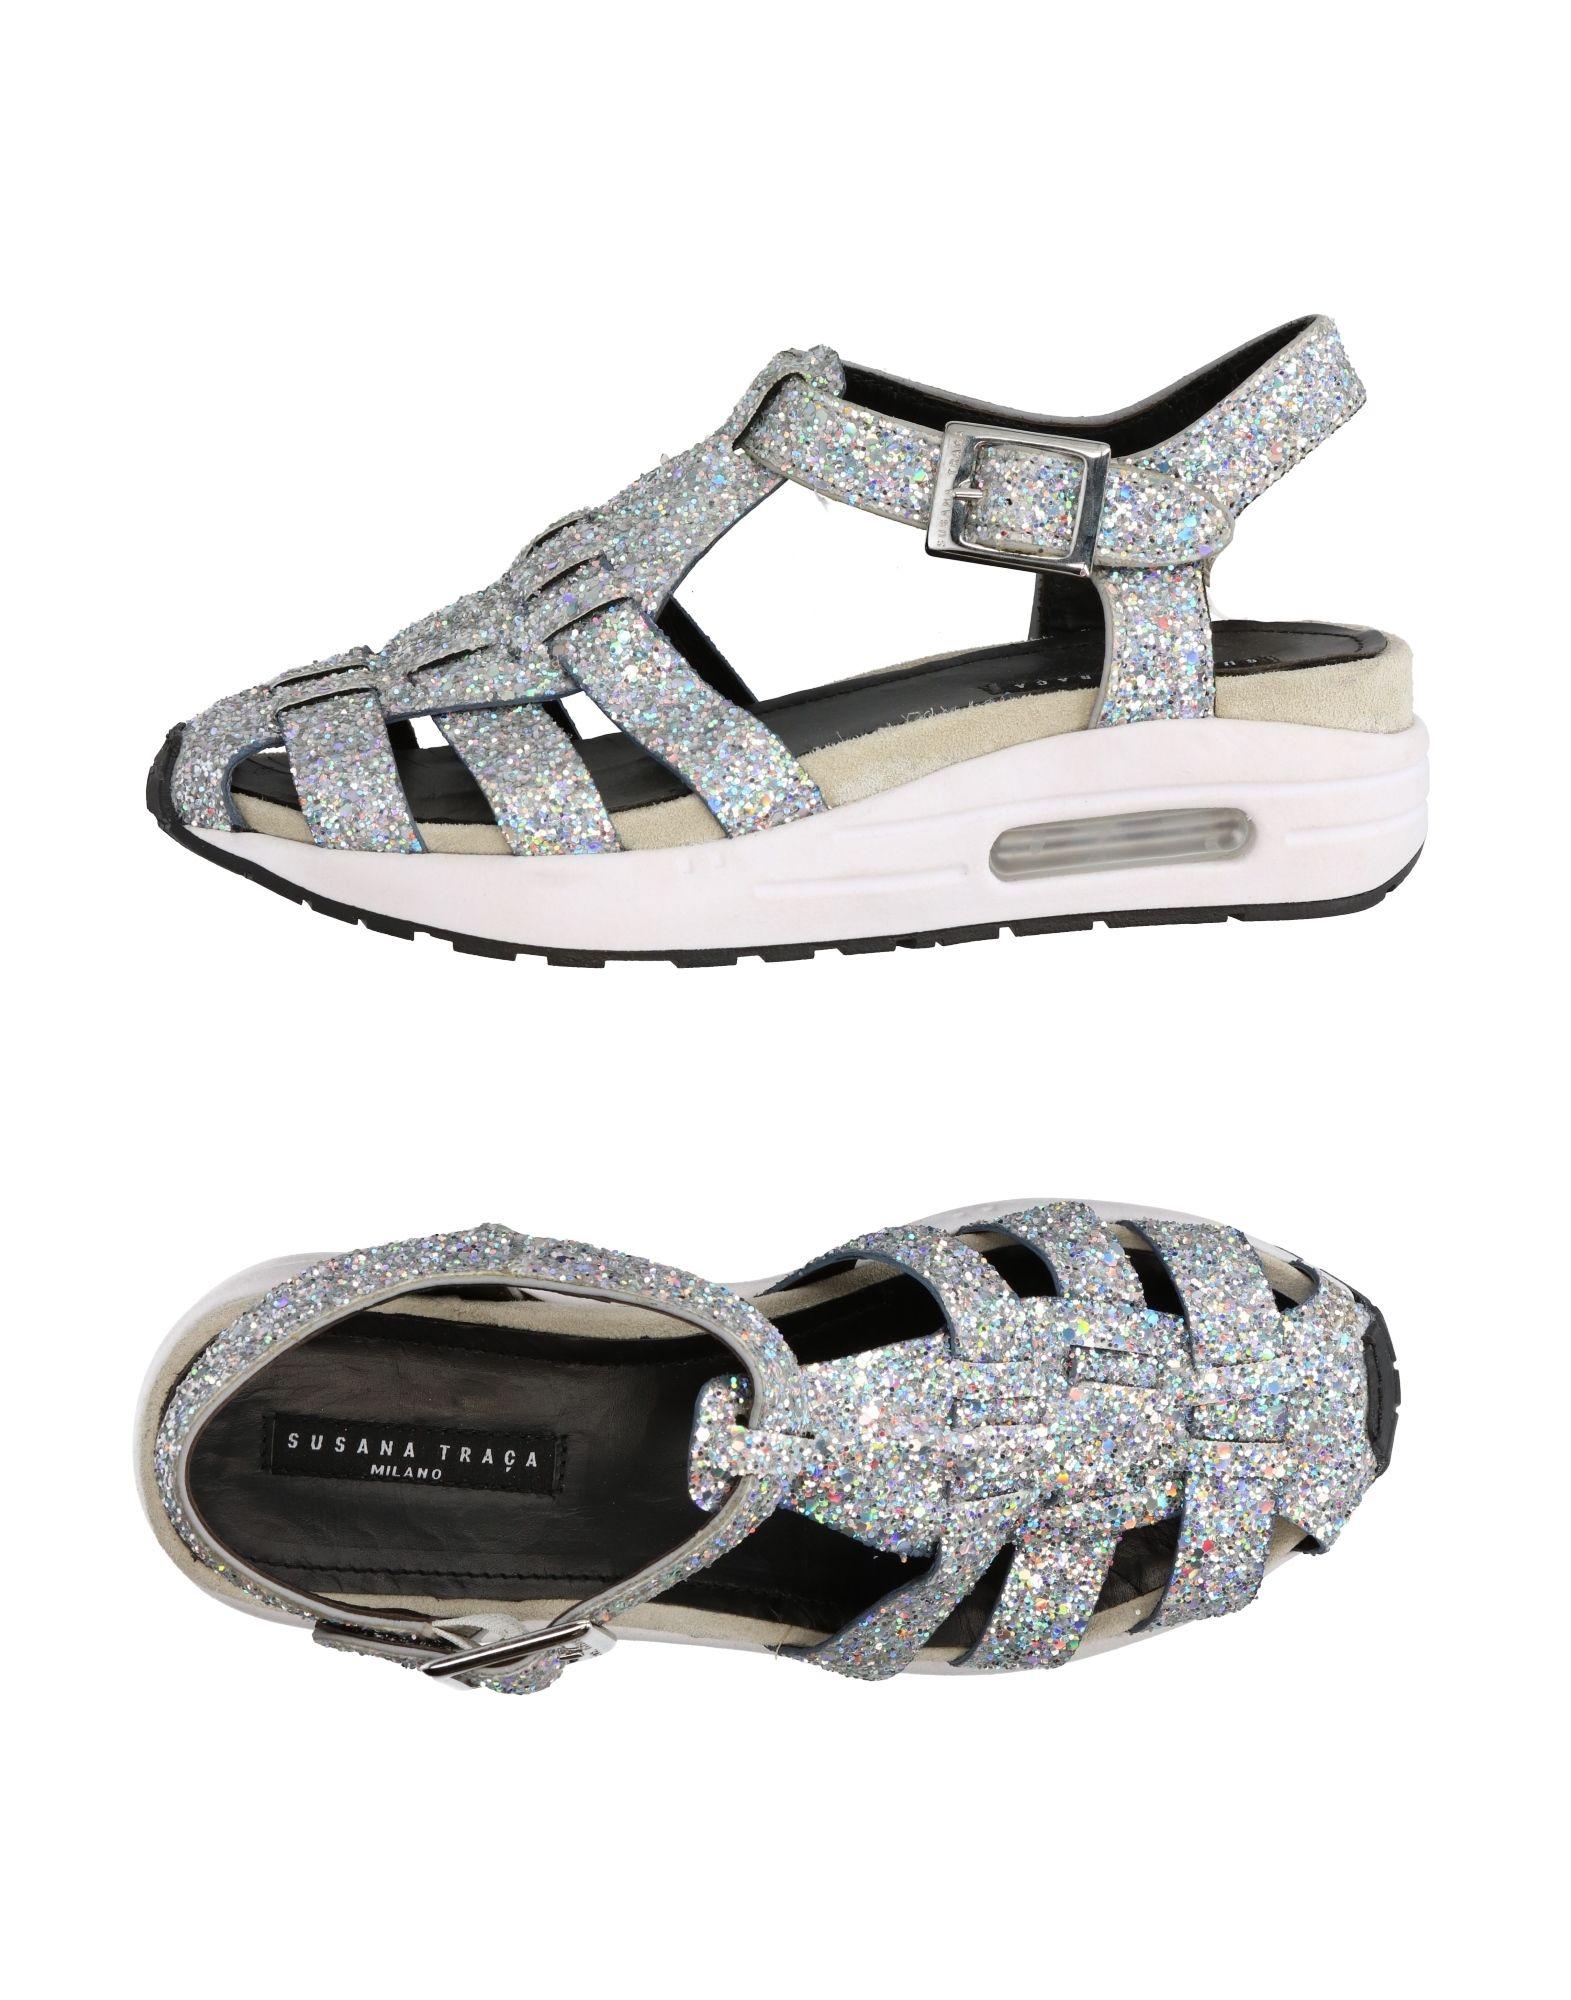 Susana Traca Sandalen Damen  11295099WB Gute Qualität beliebte Schuhe